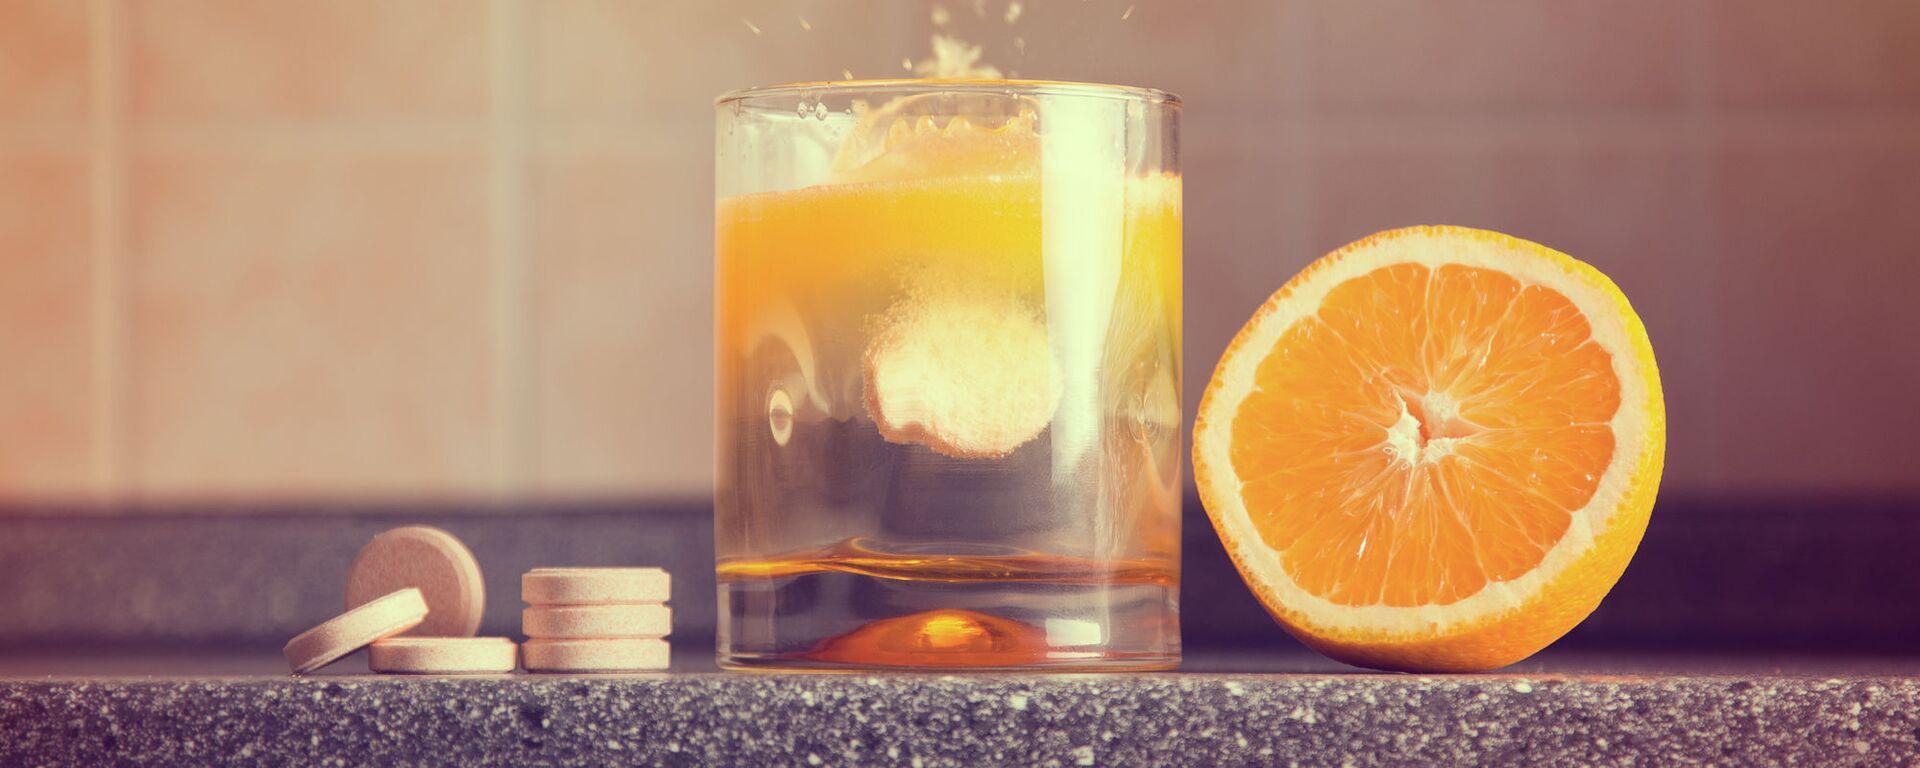 vitamin C - Sputnik Česká republika, 1920, 27.10.2020